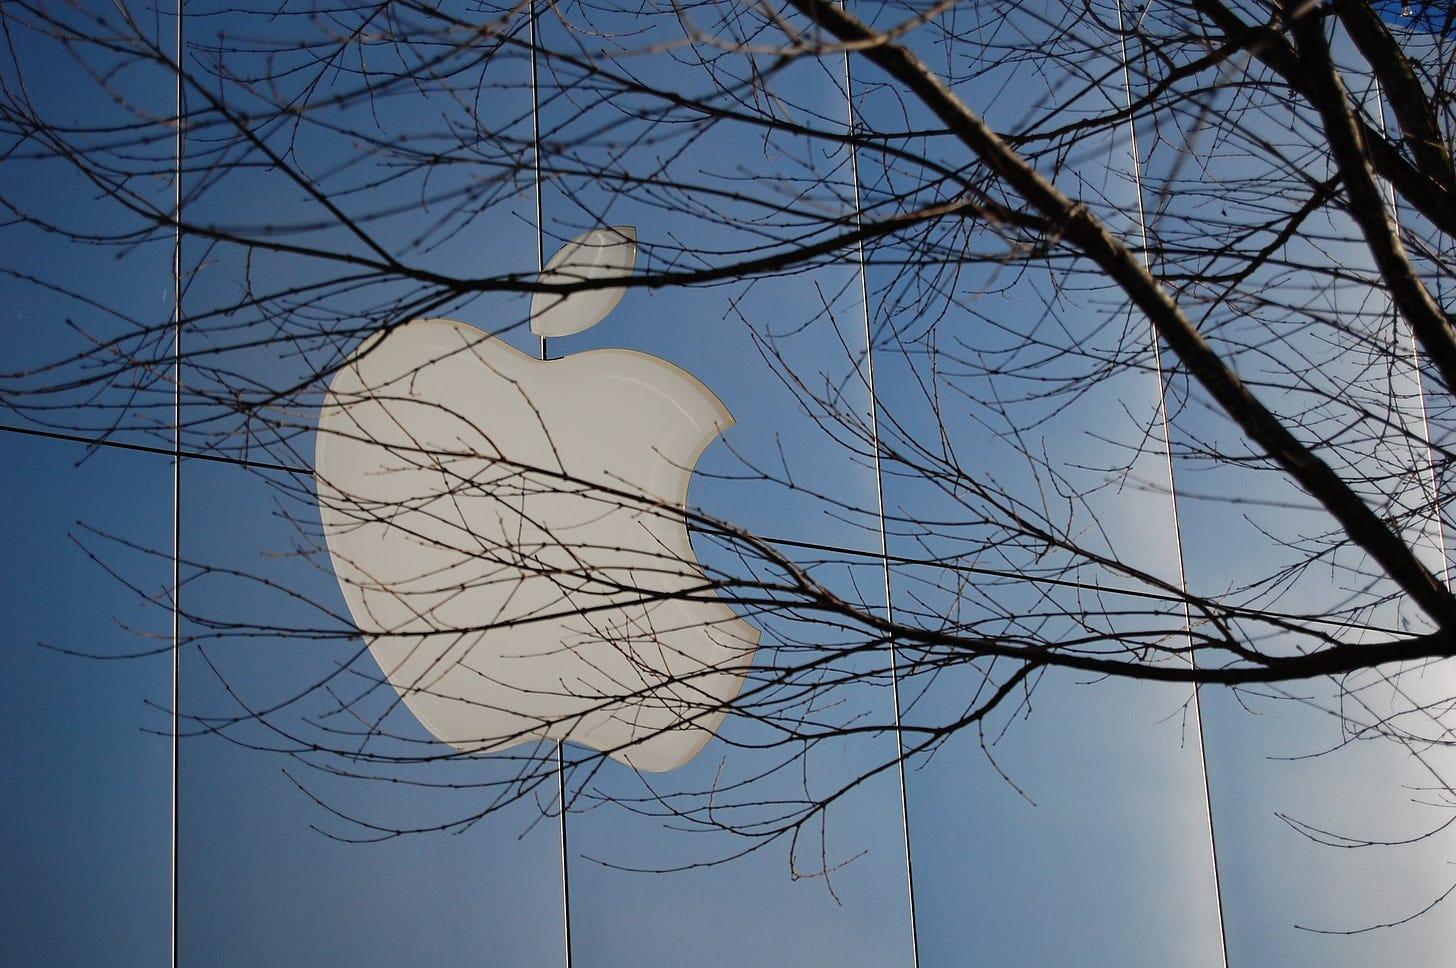 Apple logo on building